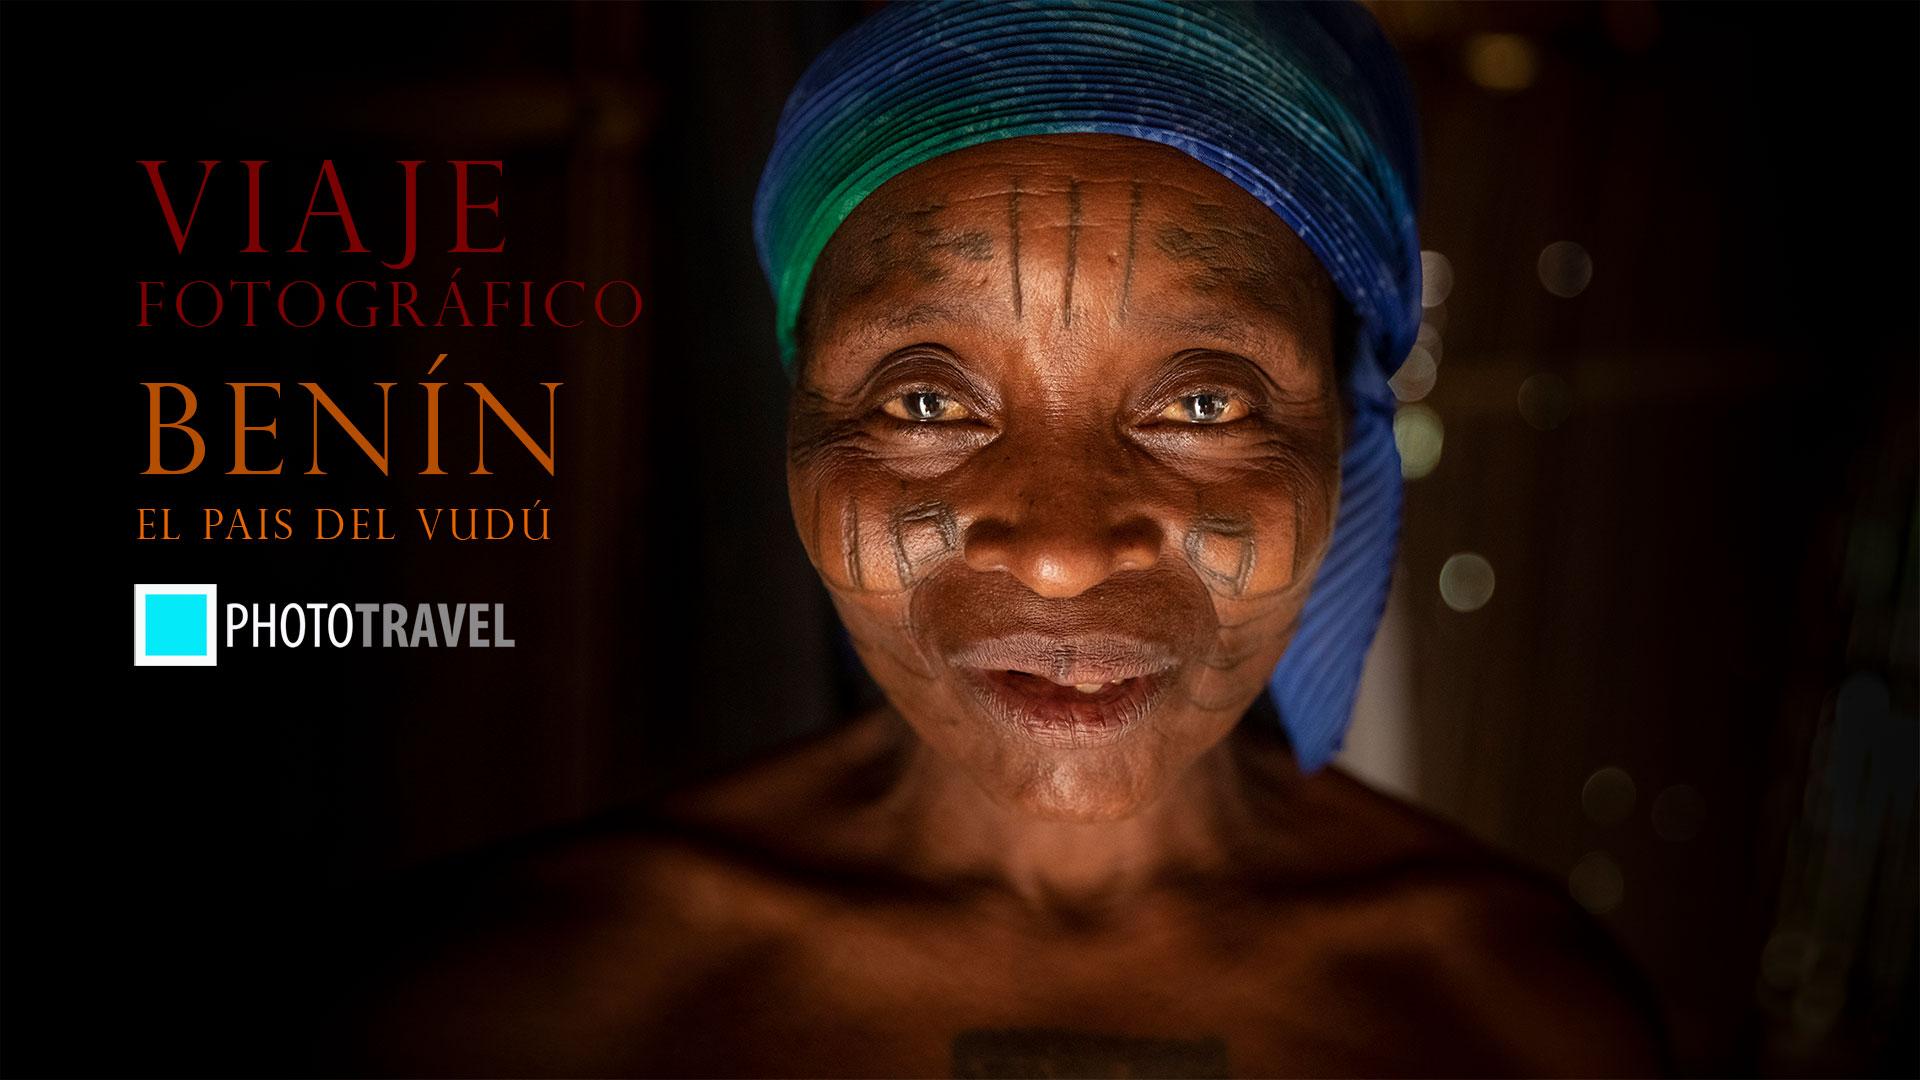 viaje-fotografico-benin-2020